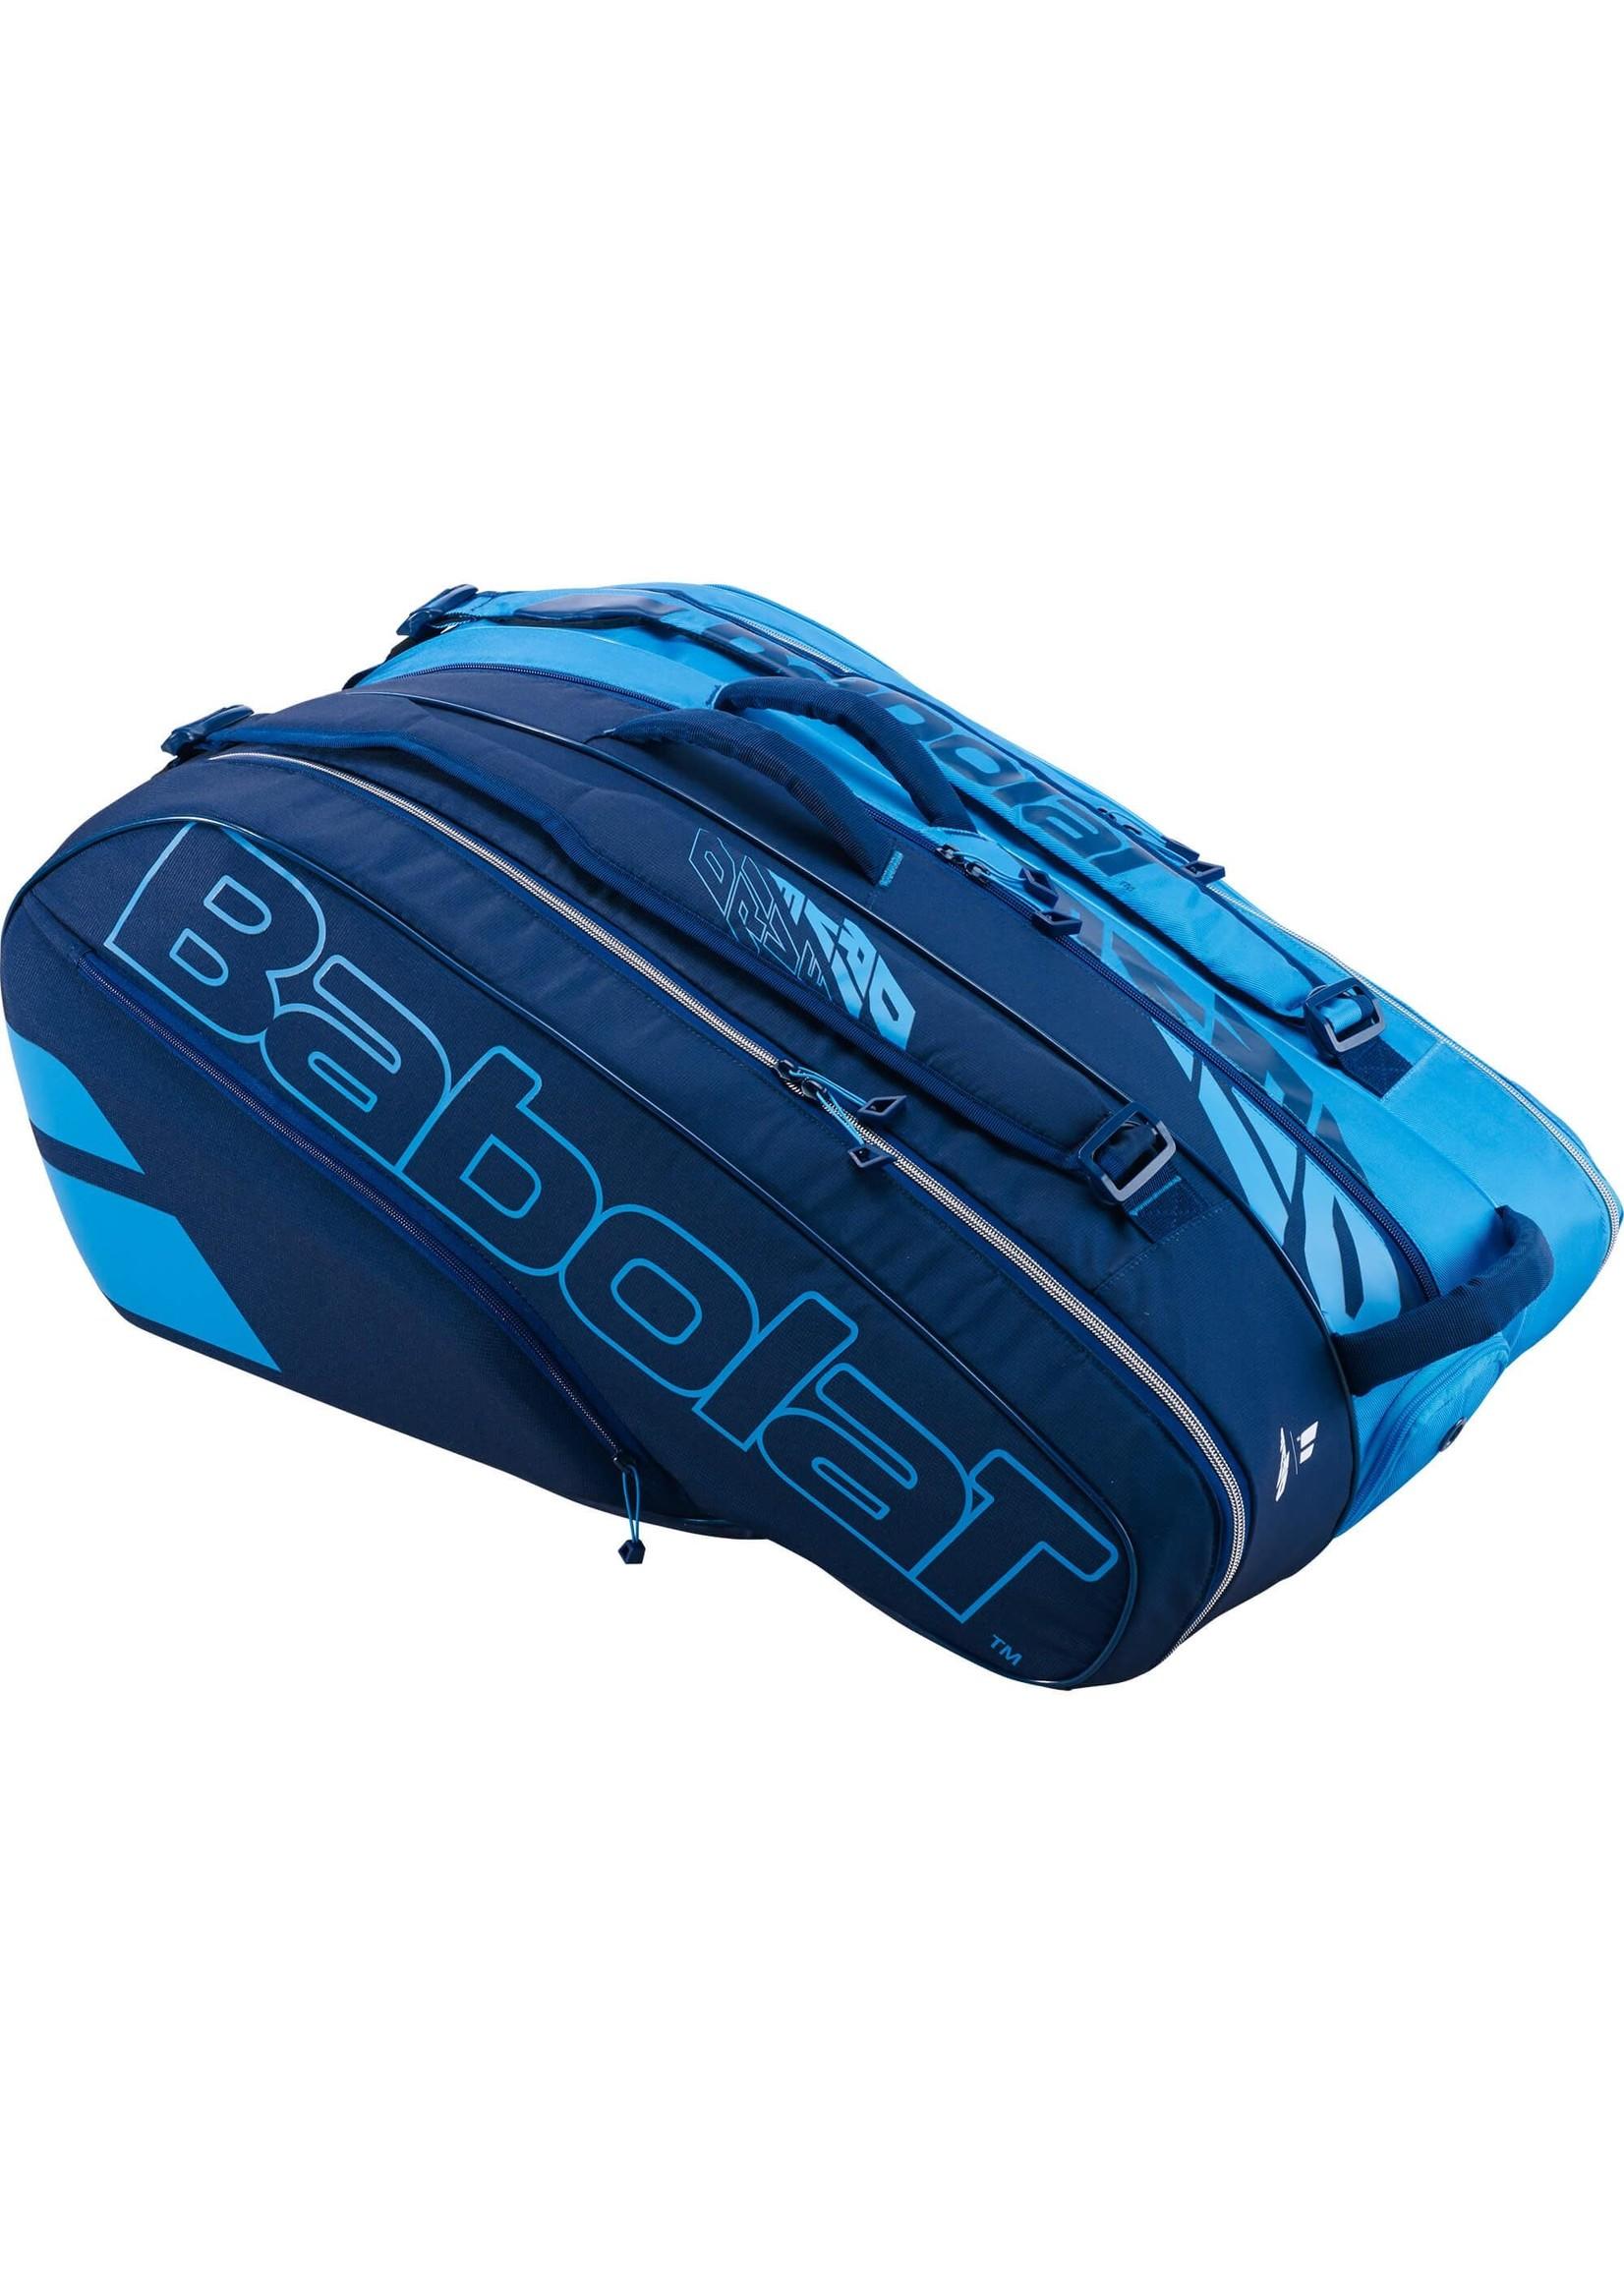 Babolat Babolat Pure Drive 12 Racket Bag (2021)